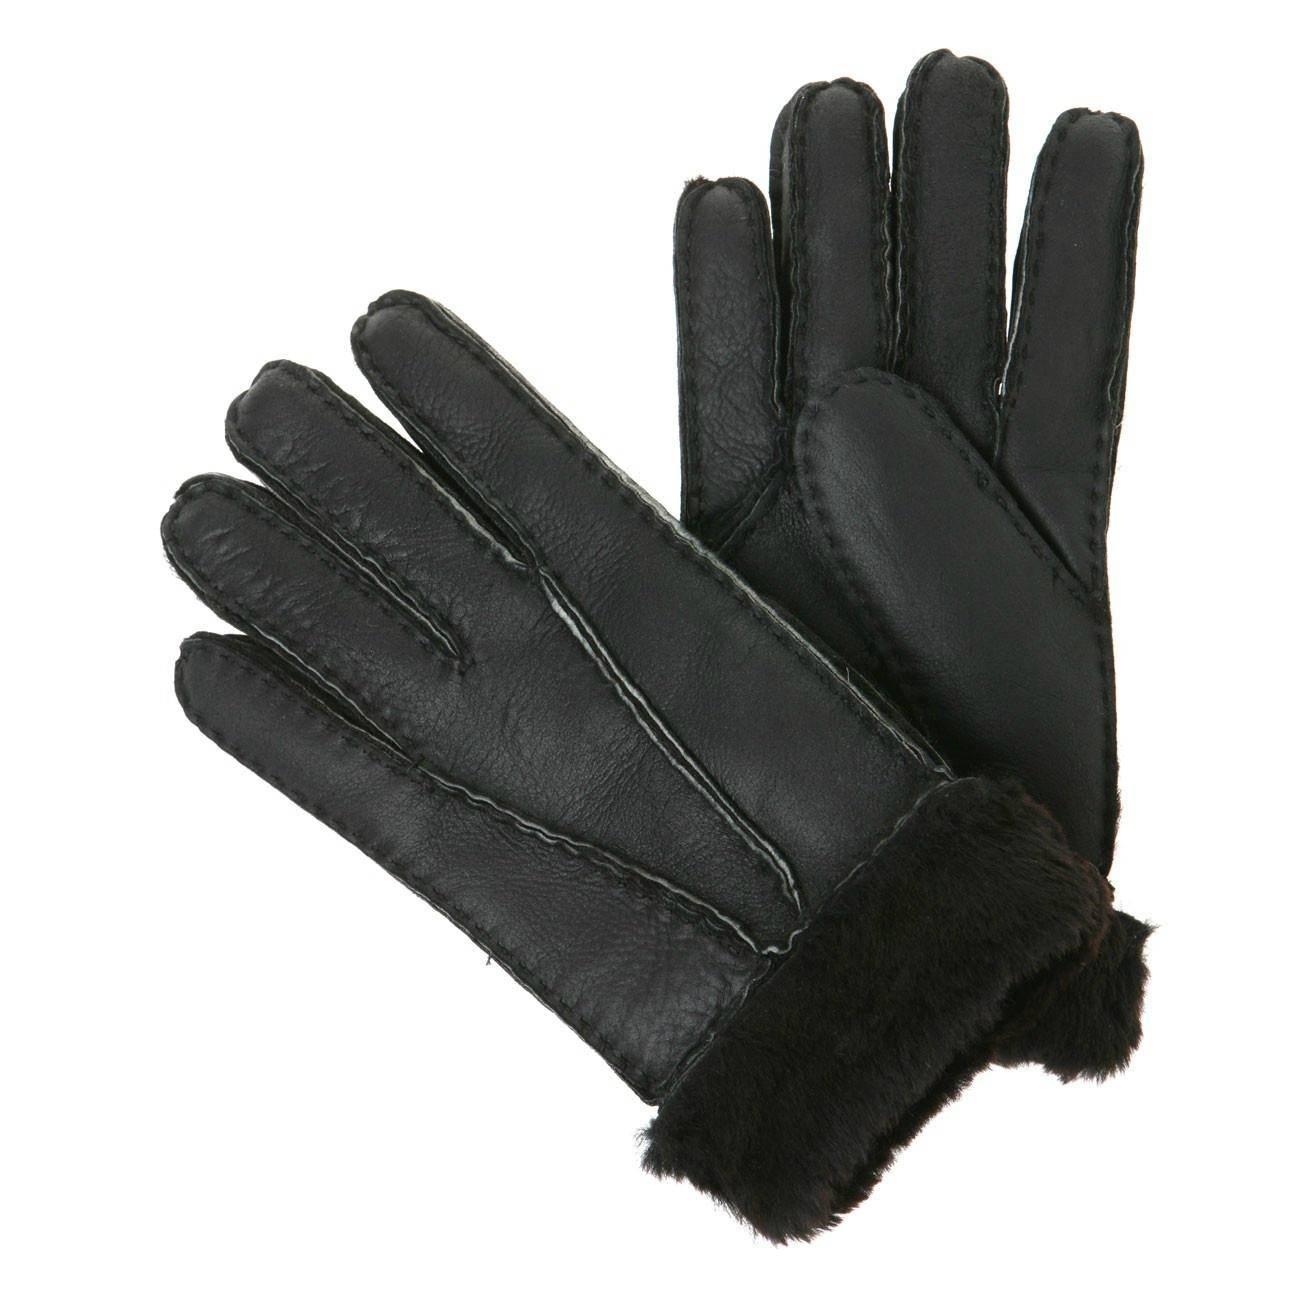 100% leather gloves for men